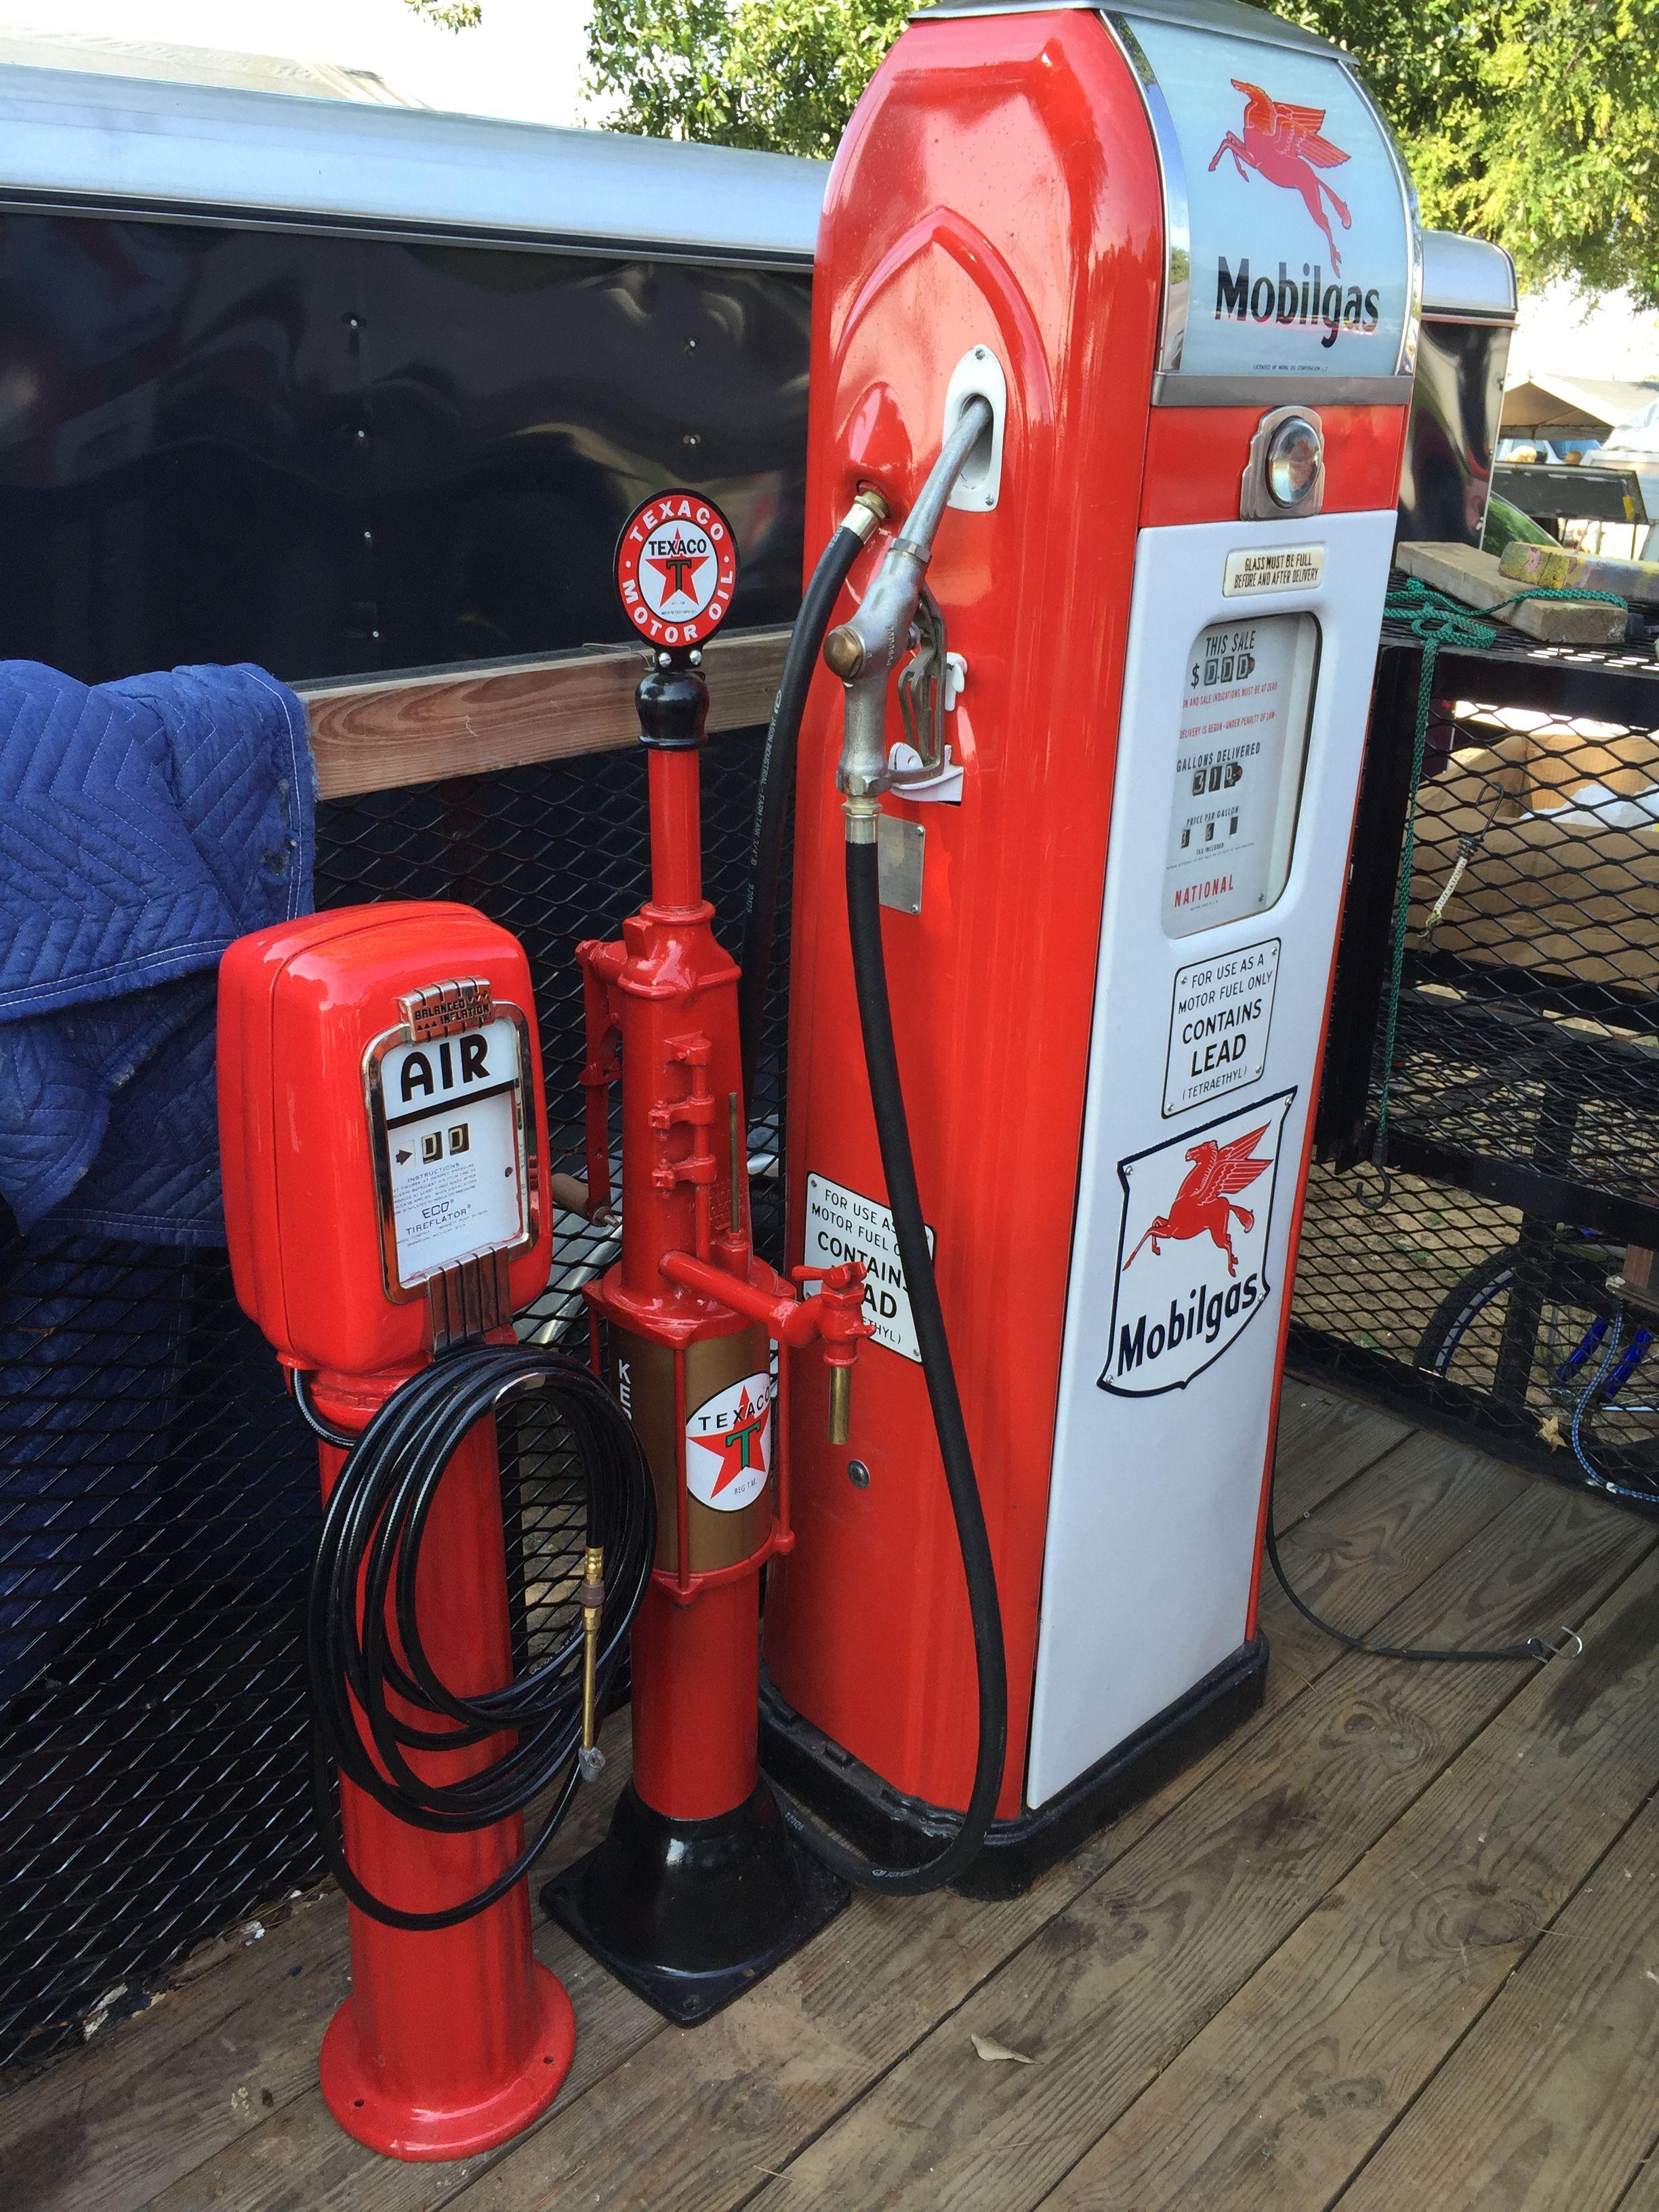 Mobile pump, Texaco air compressor, and vintage kerosene